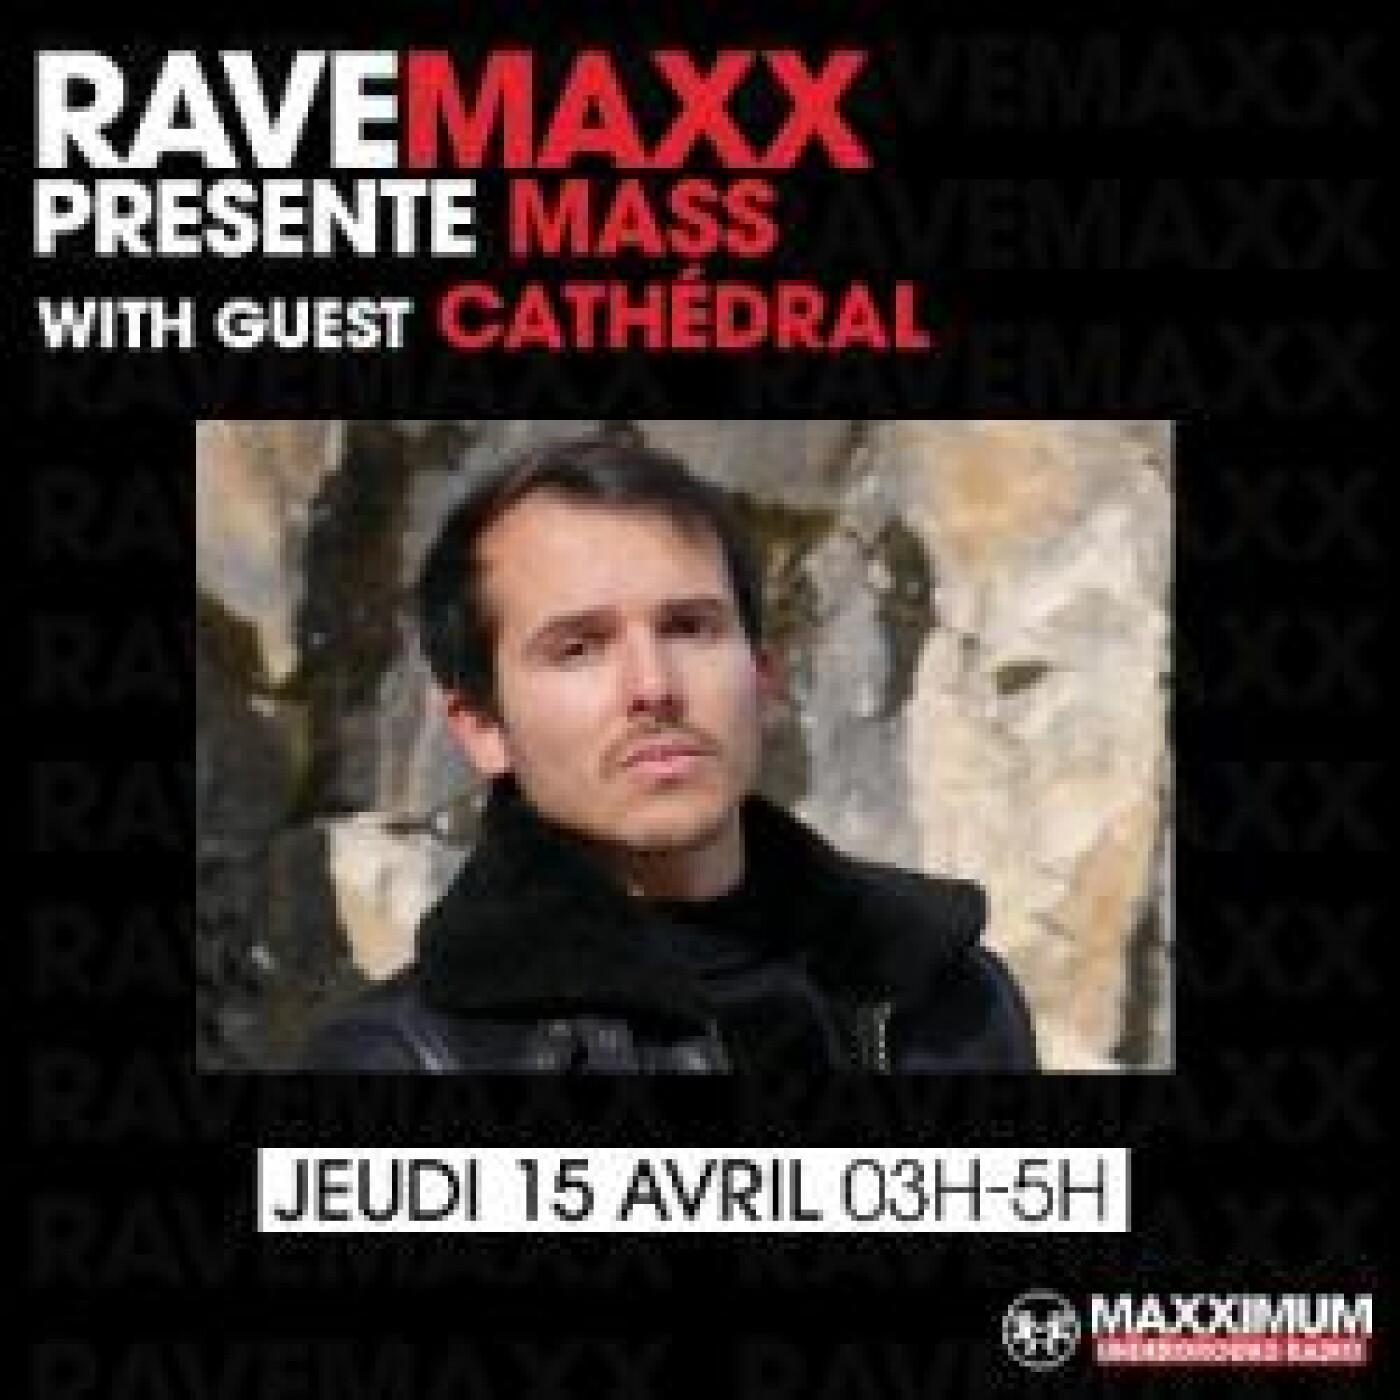 RAVEMAXX : CATHEDRAL